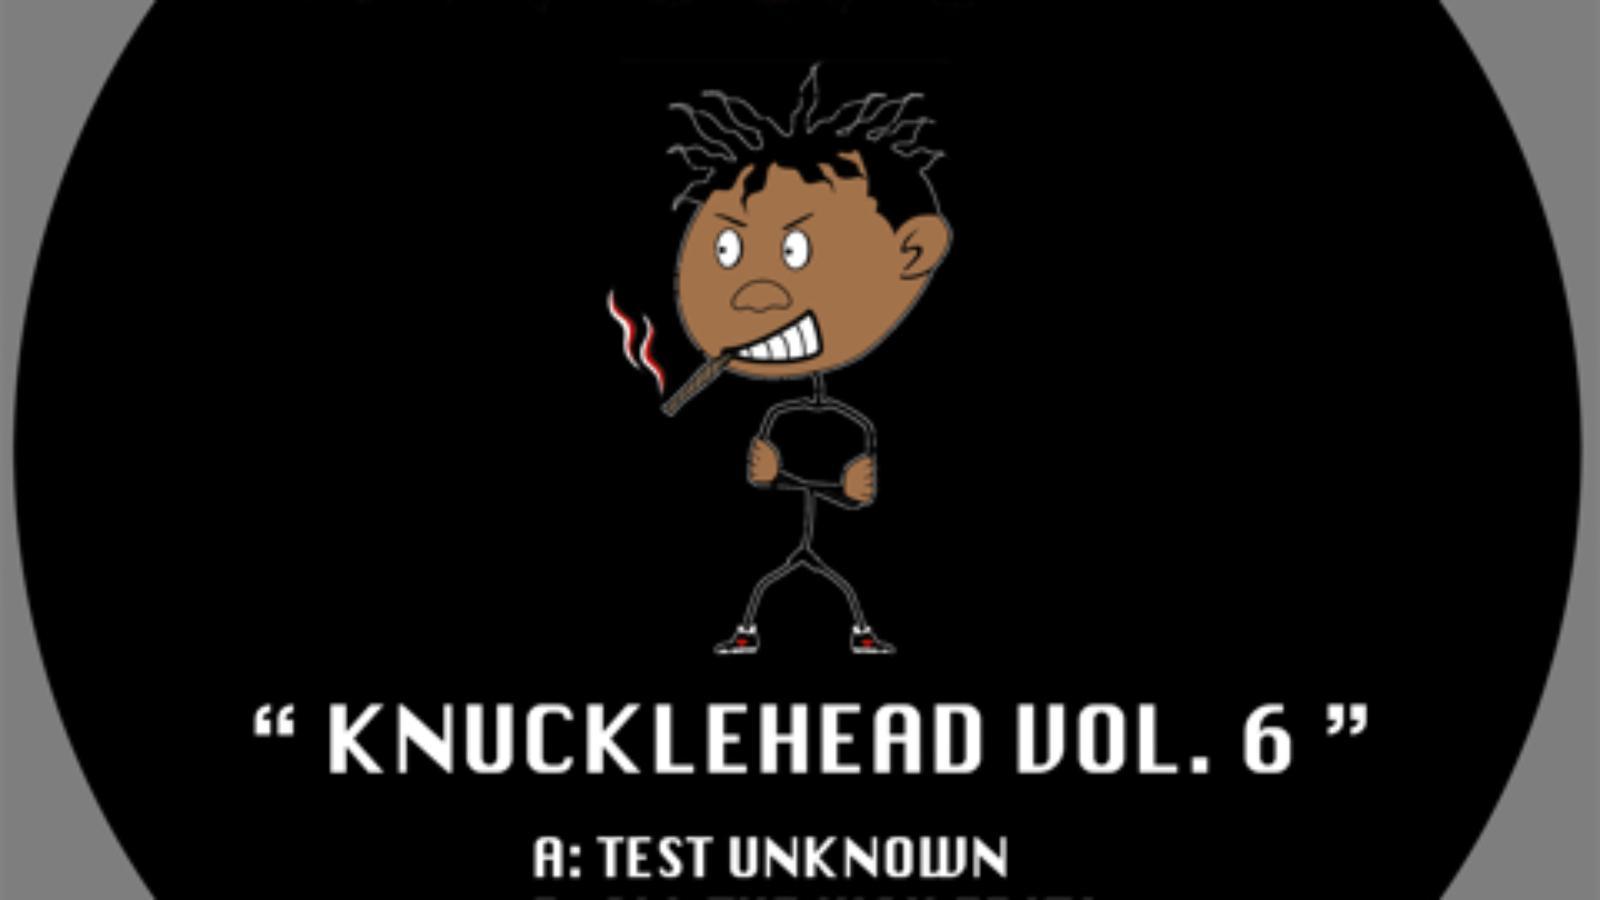 EddieFowlkes_KnuckleheadVol6_Artwork